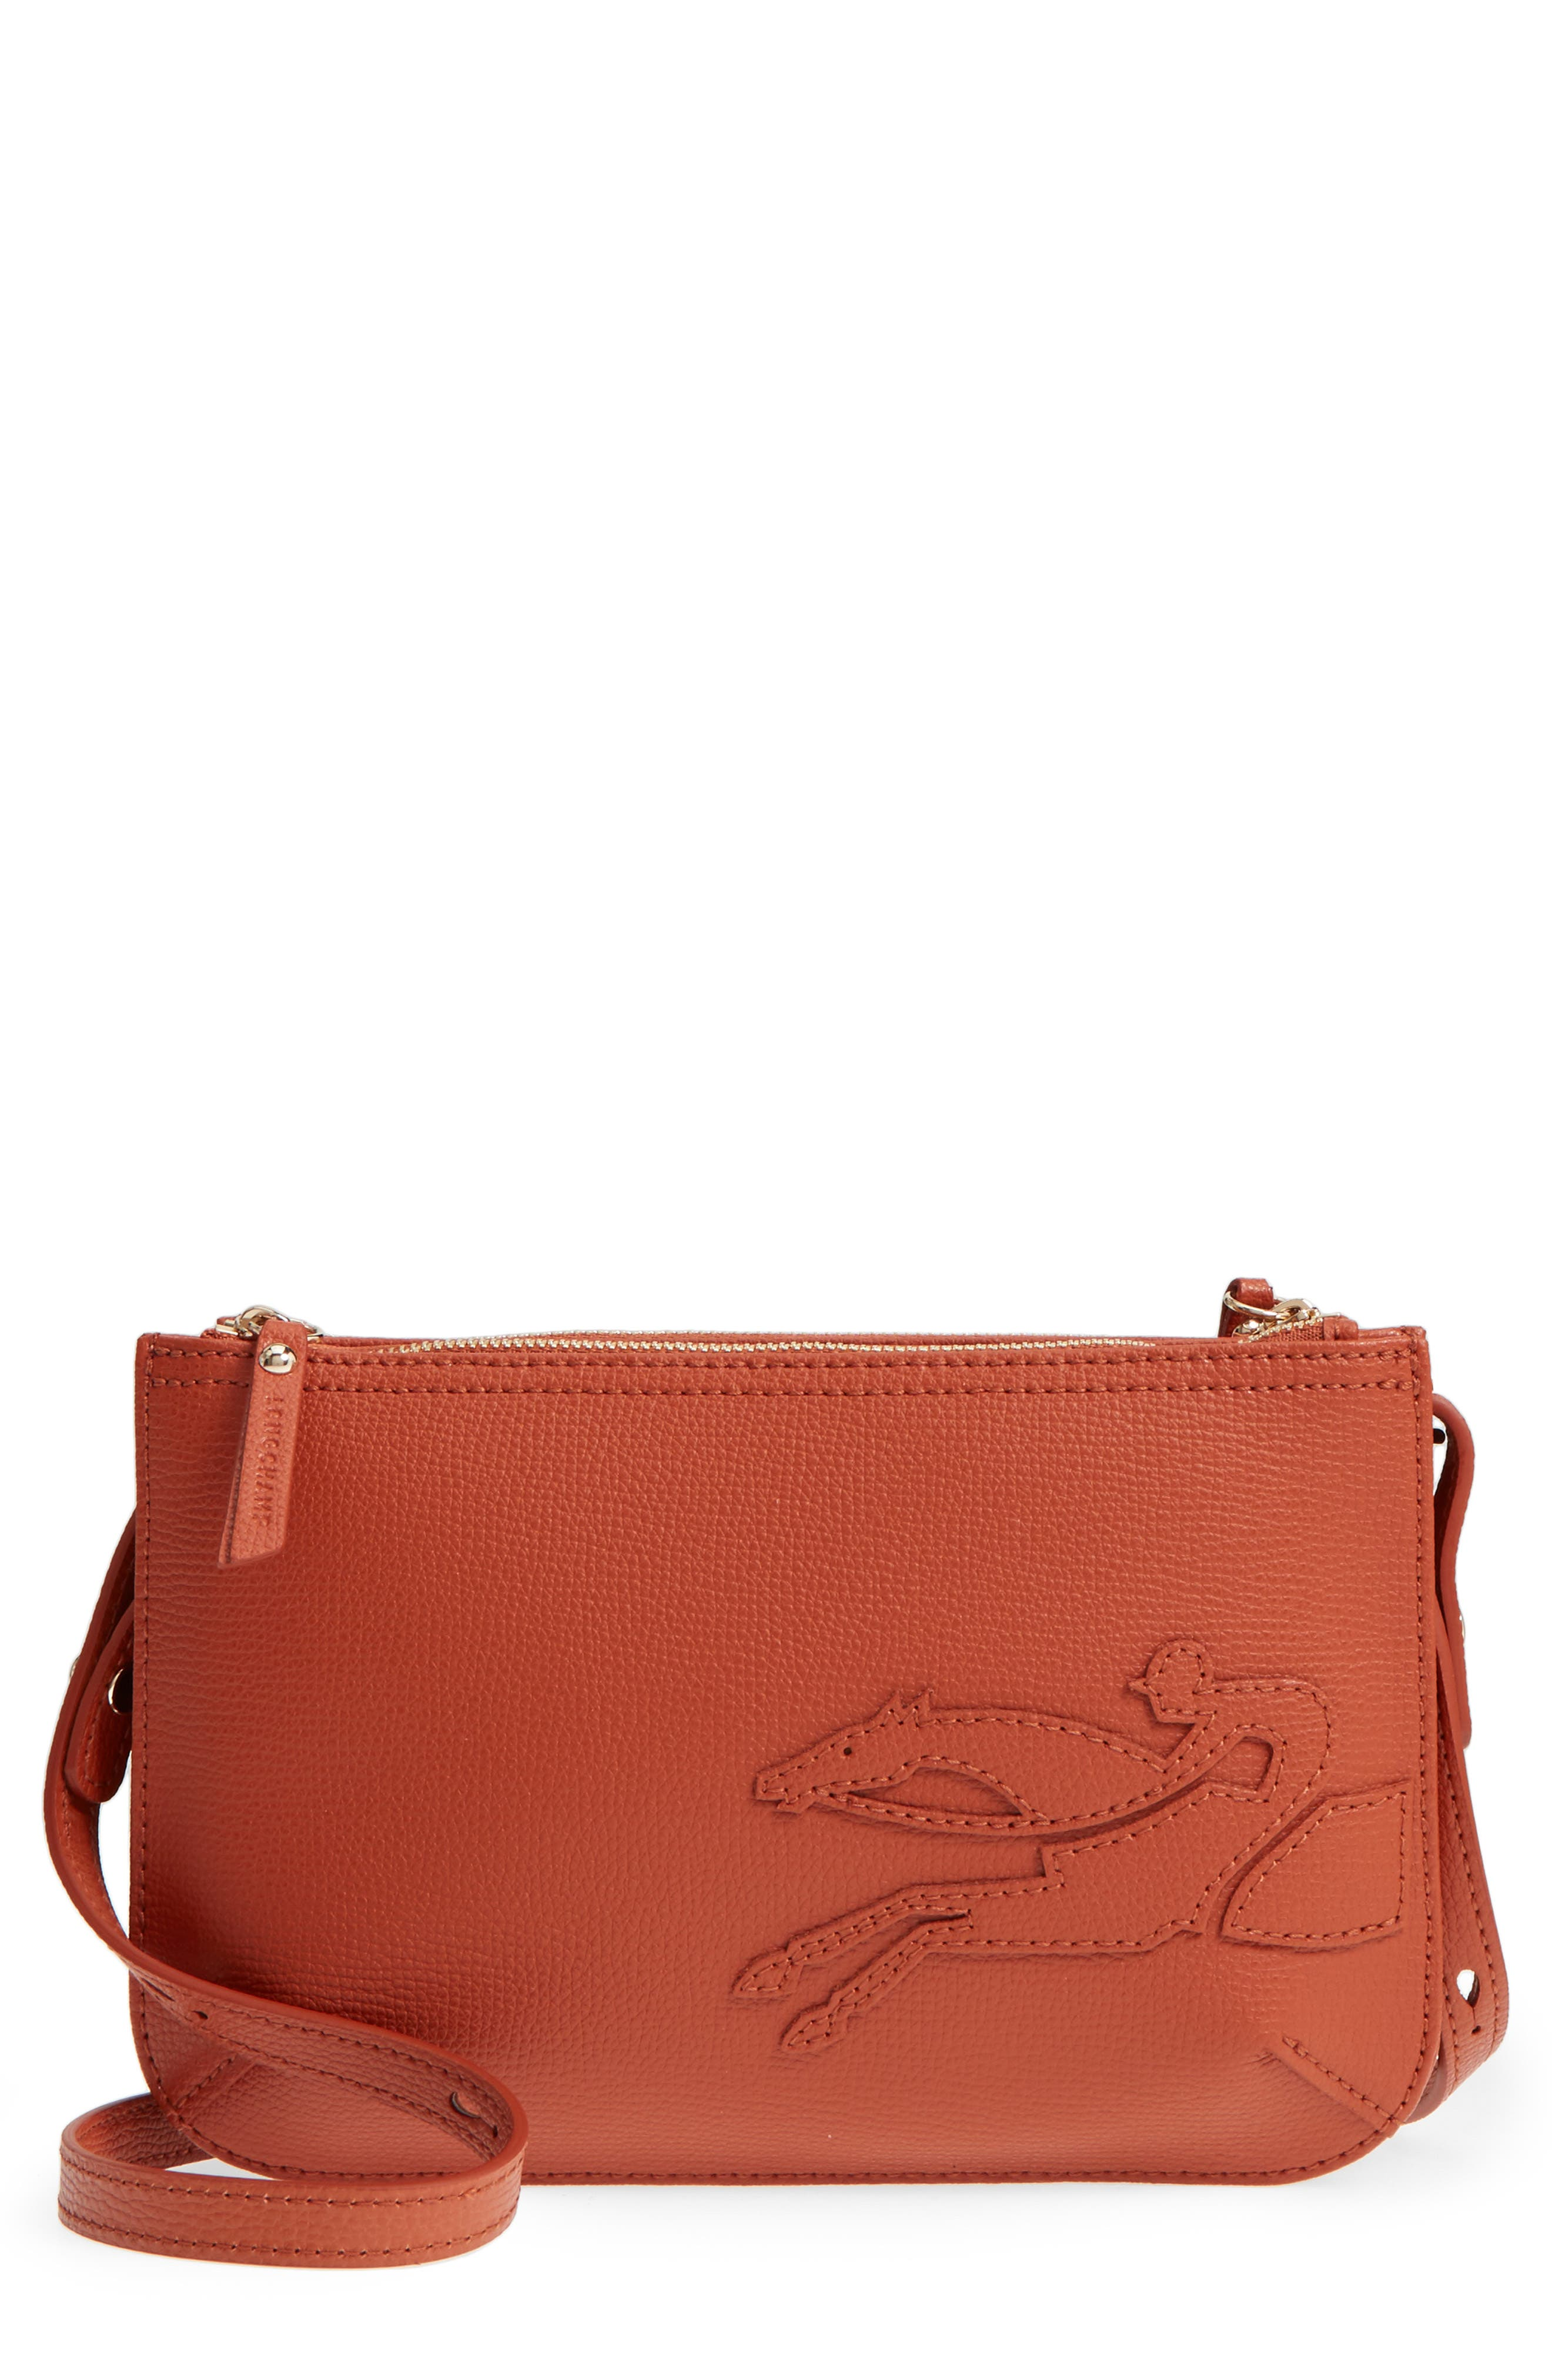 Longchamp Shop-It Leather Crossbody Bag